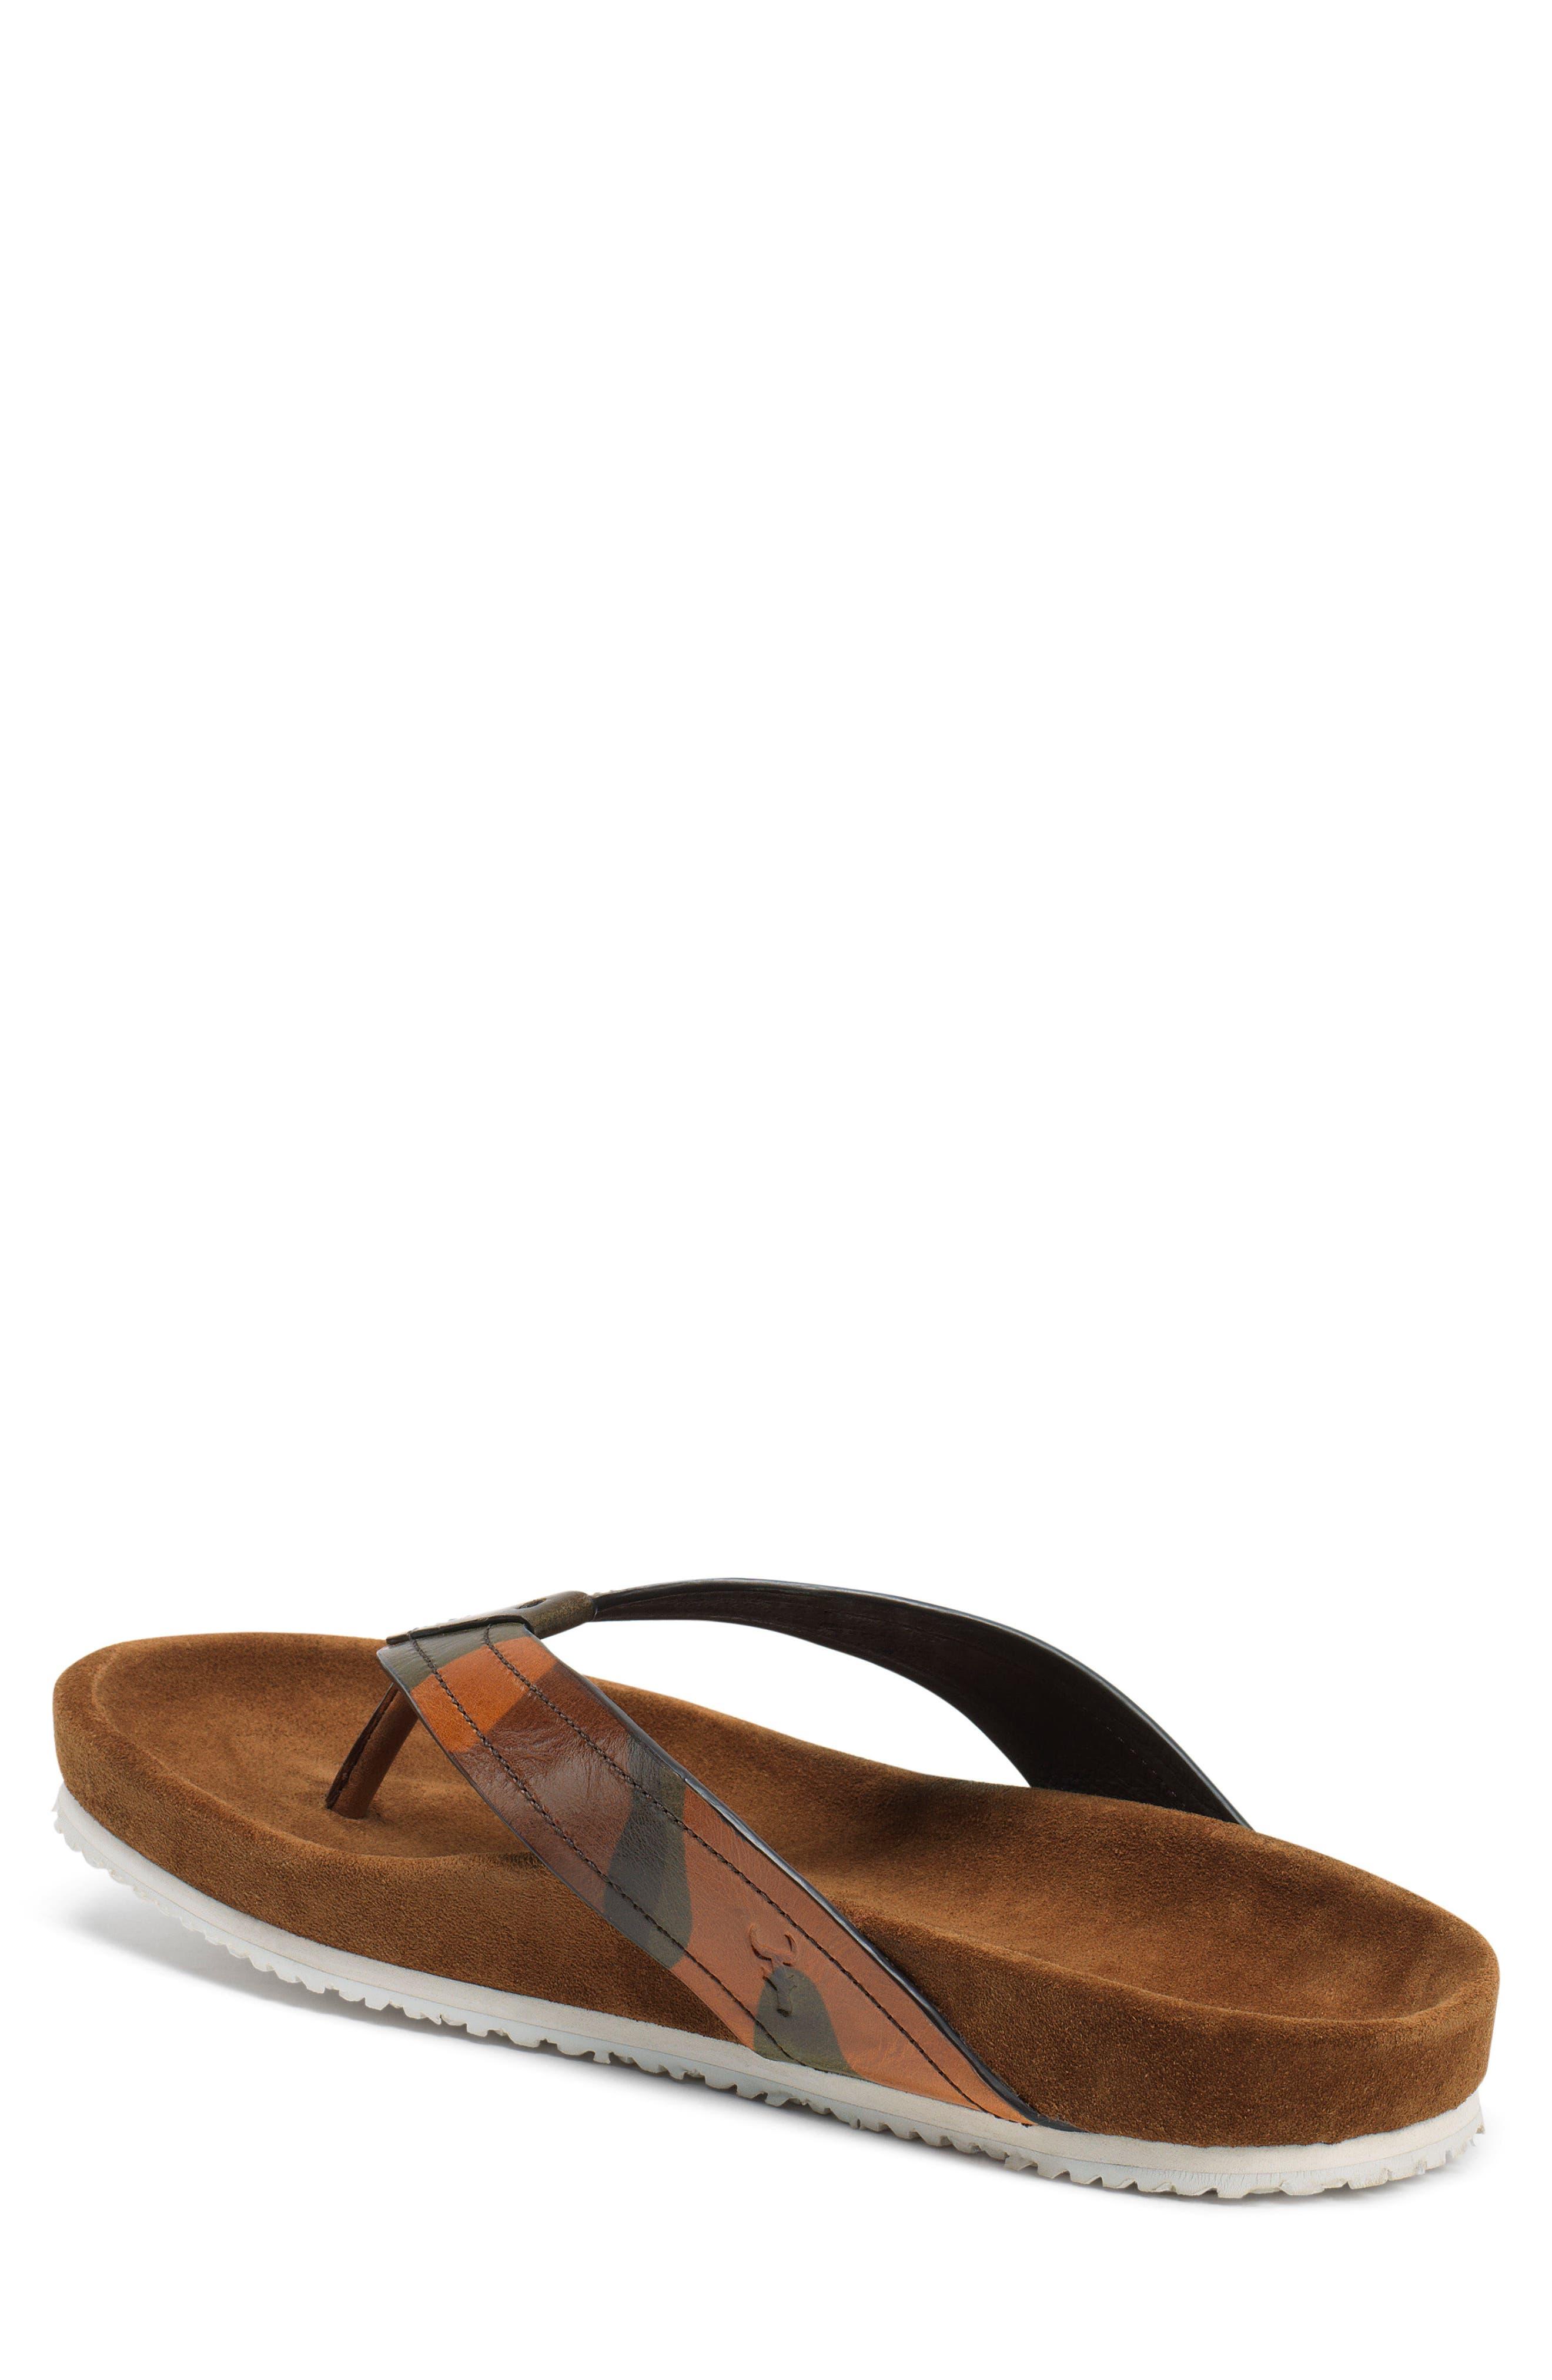 Fleming Flip Flop,                             Alternate thumbnail 2, color,                             Camoflage Leather